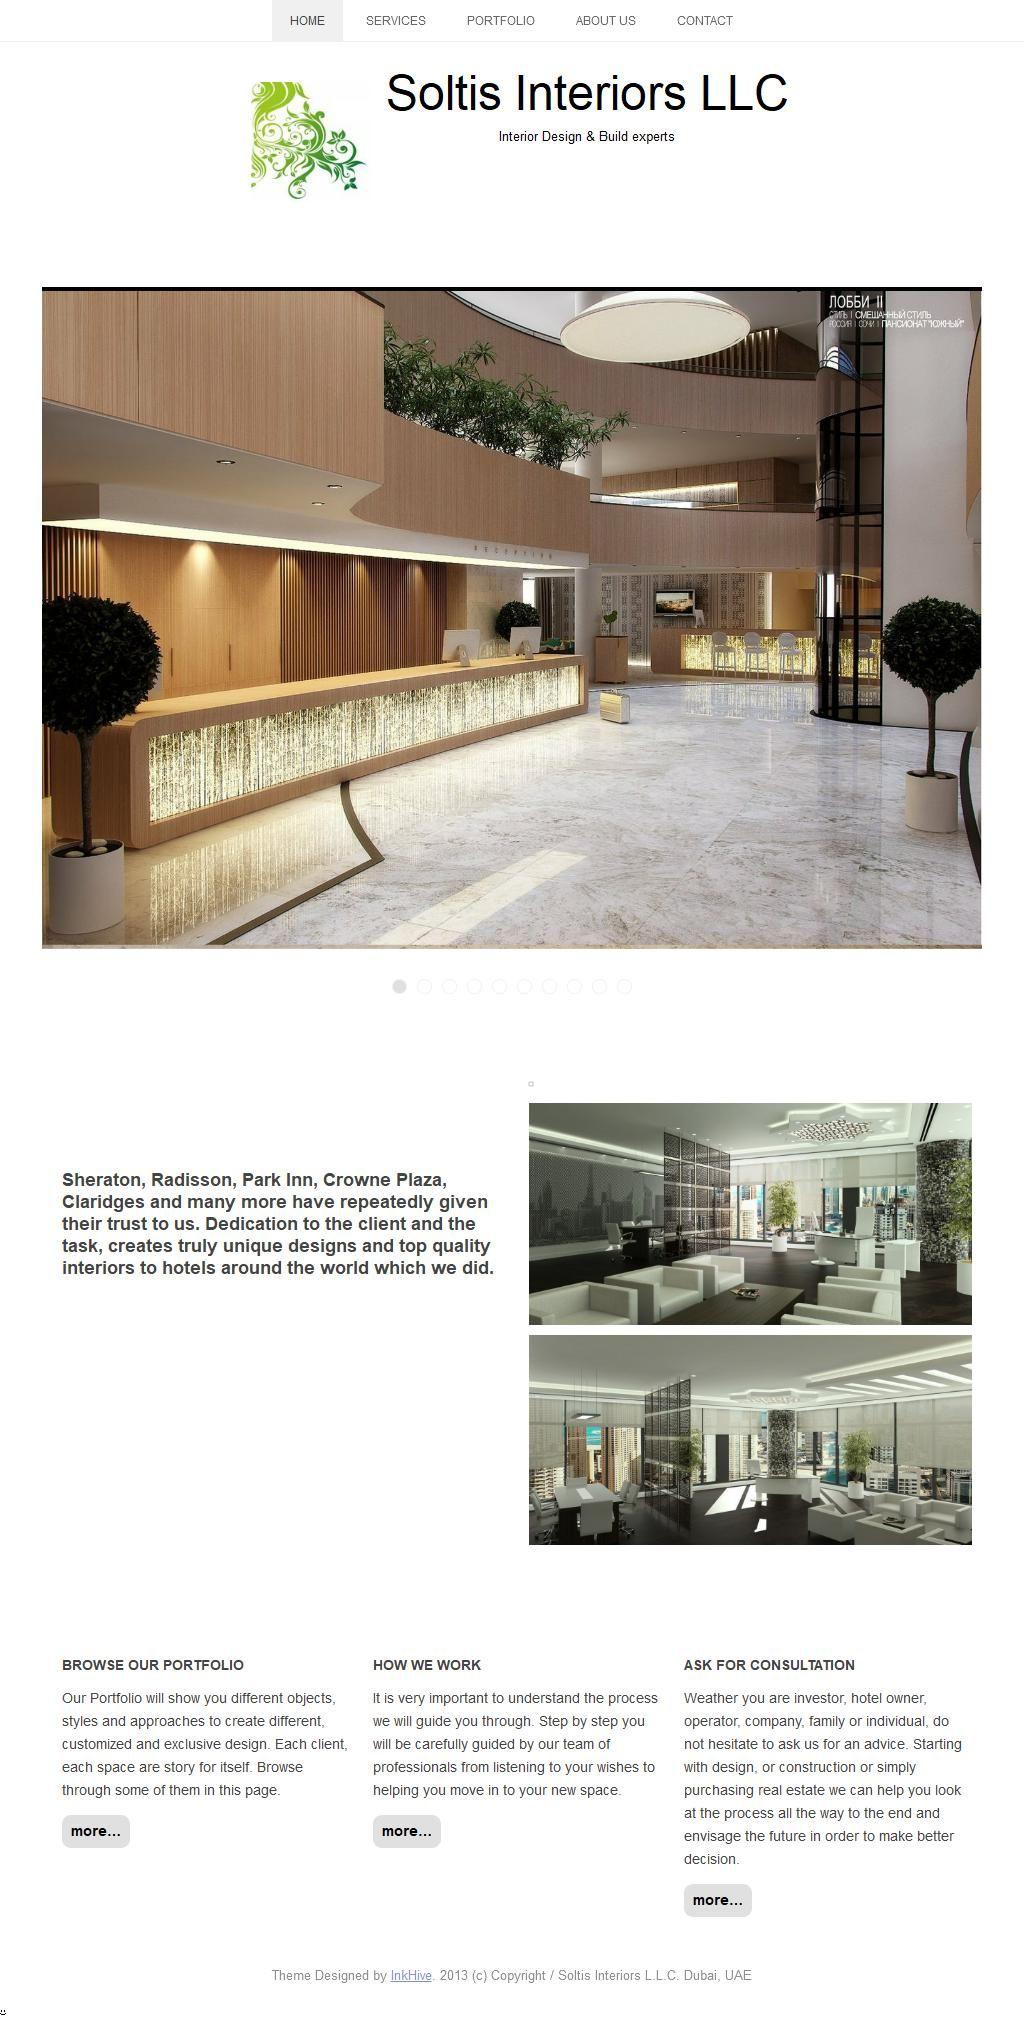 Soltis Interiors Llc D2 Tower 22 16 Street 8 Floor fice 803 Al